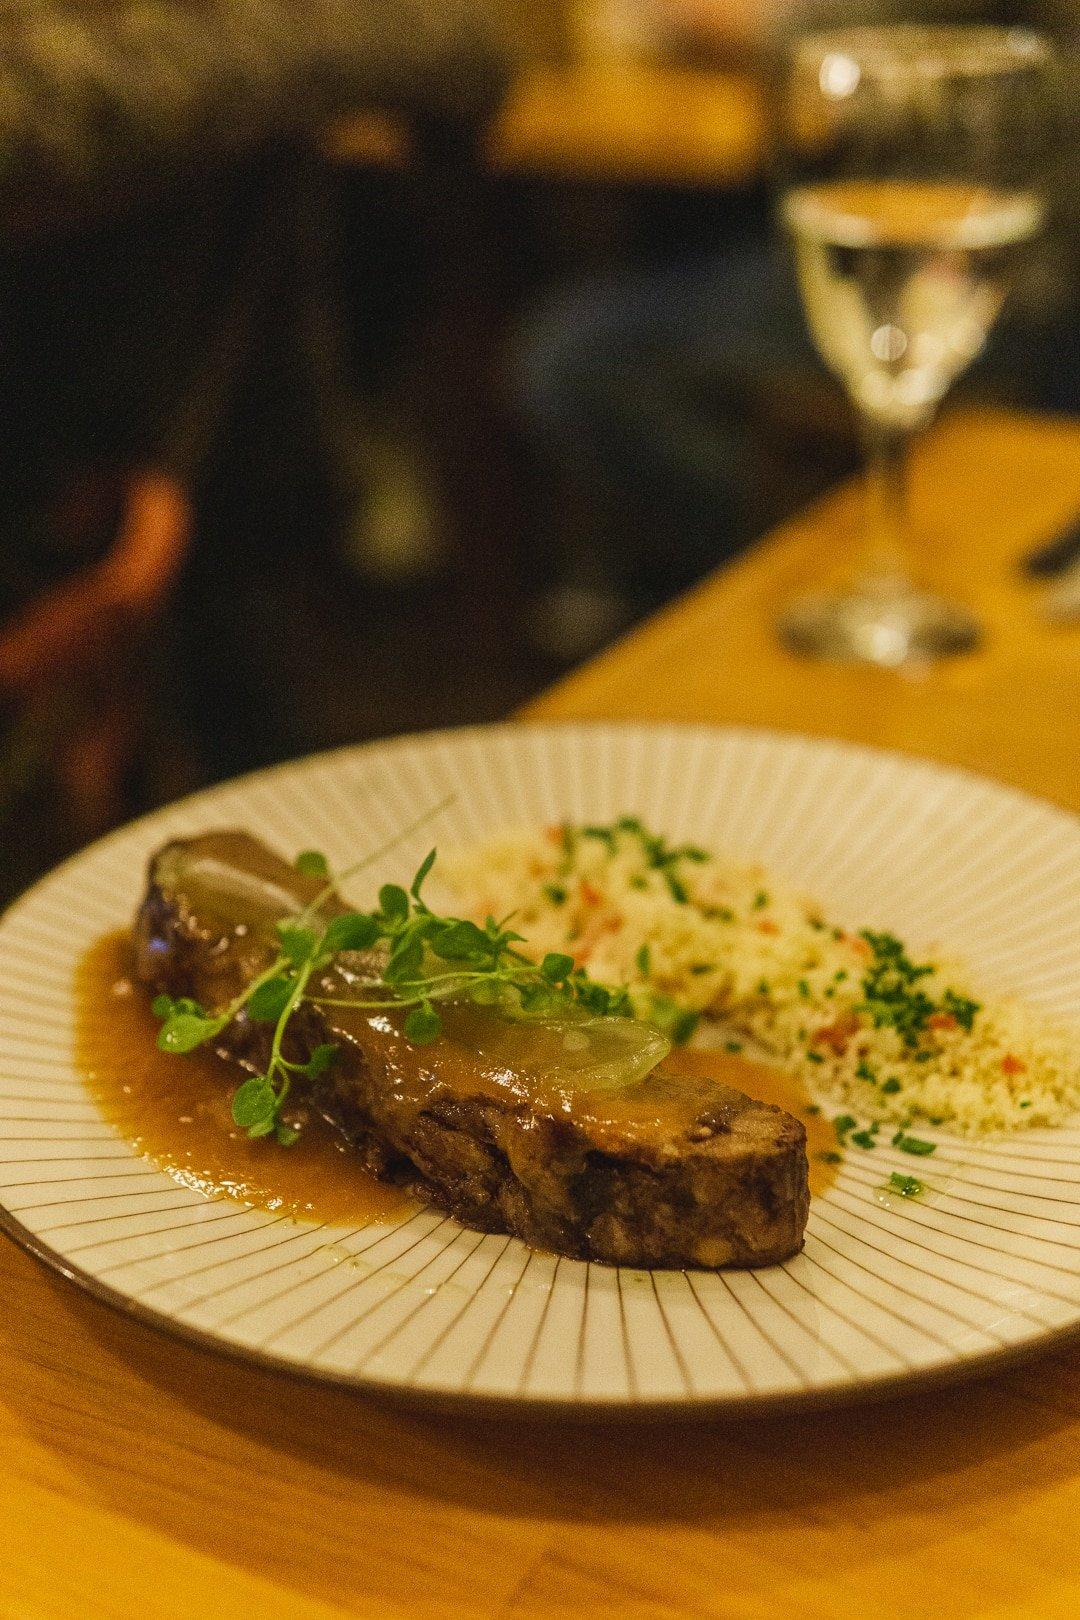 arume restaurants - avoid these restaurants in barcelona, spain